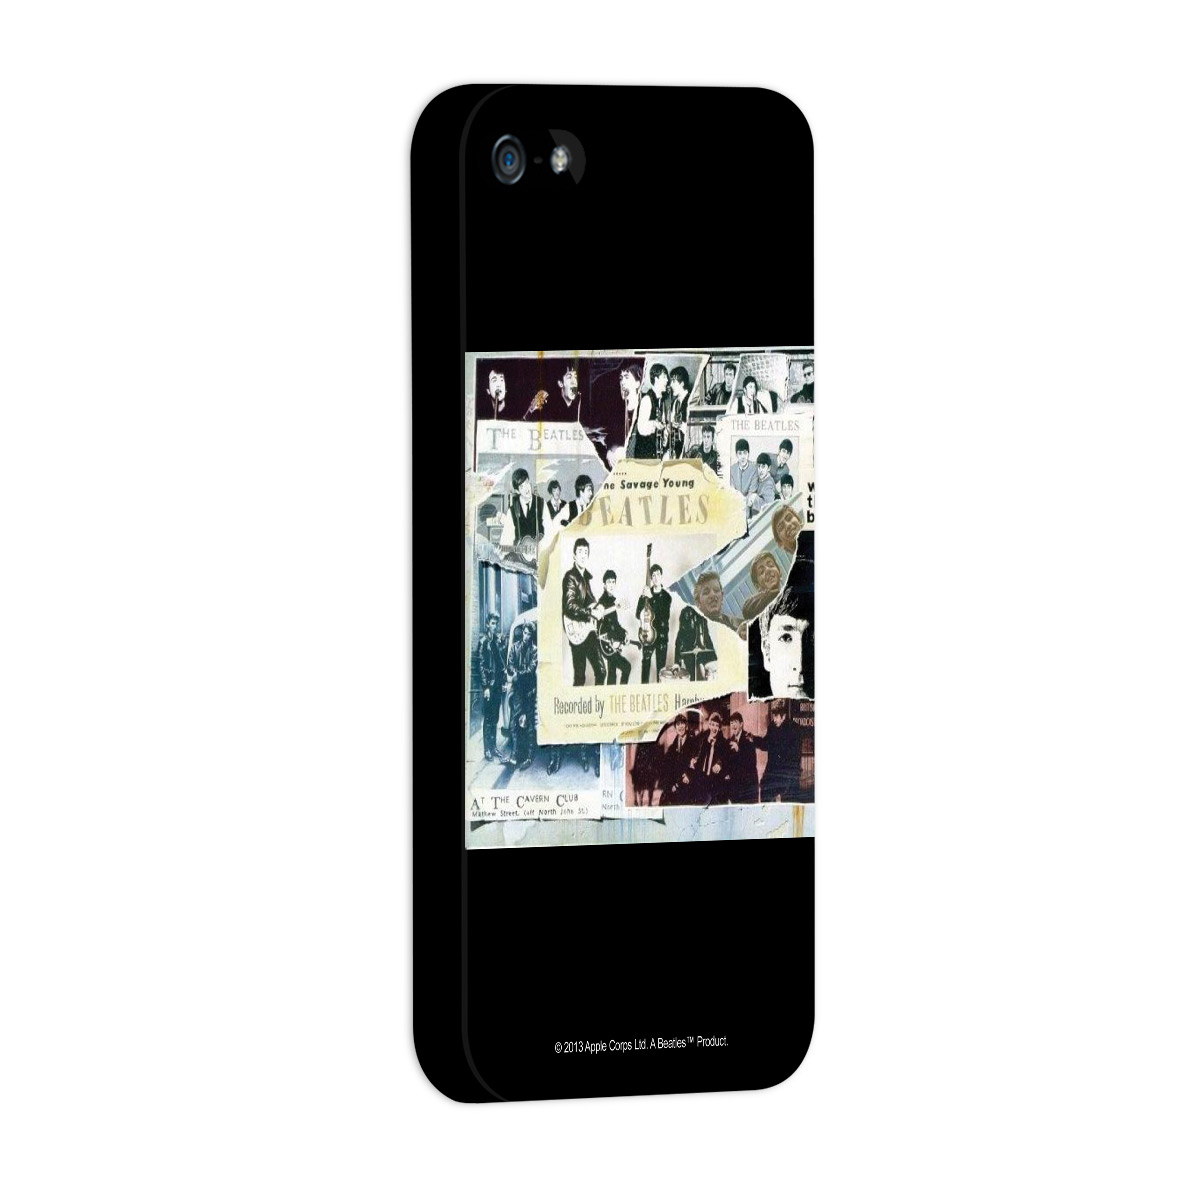 Capa de iPhone 5/5S The Beatles Anthology I